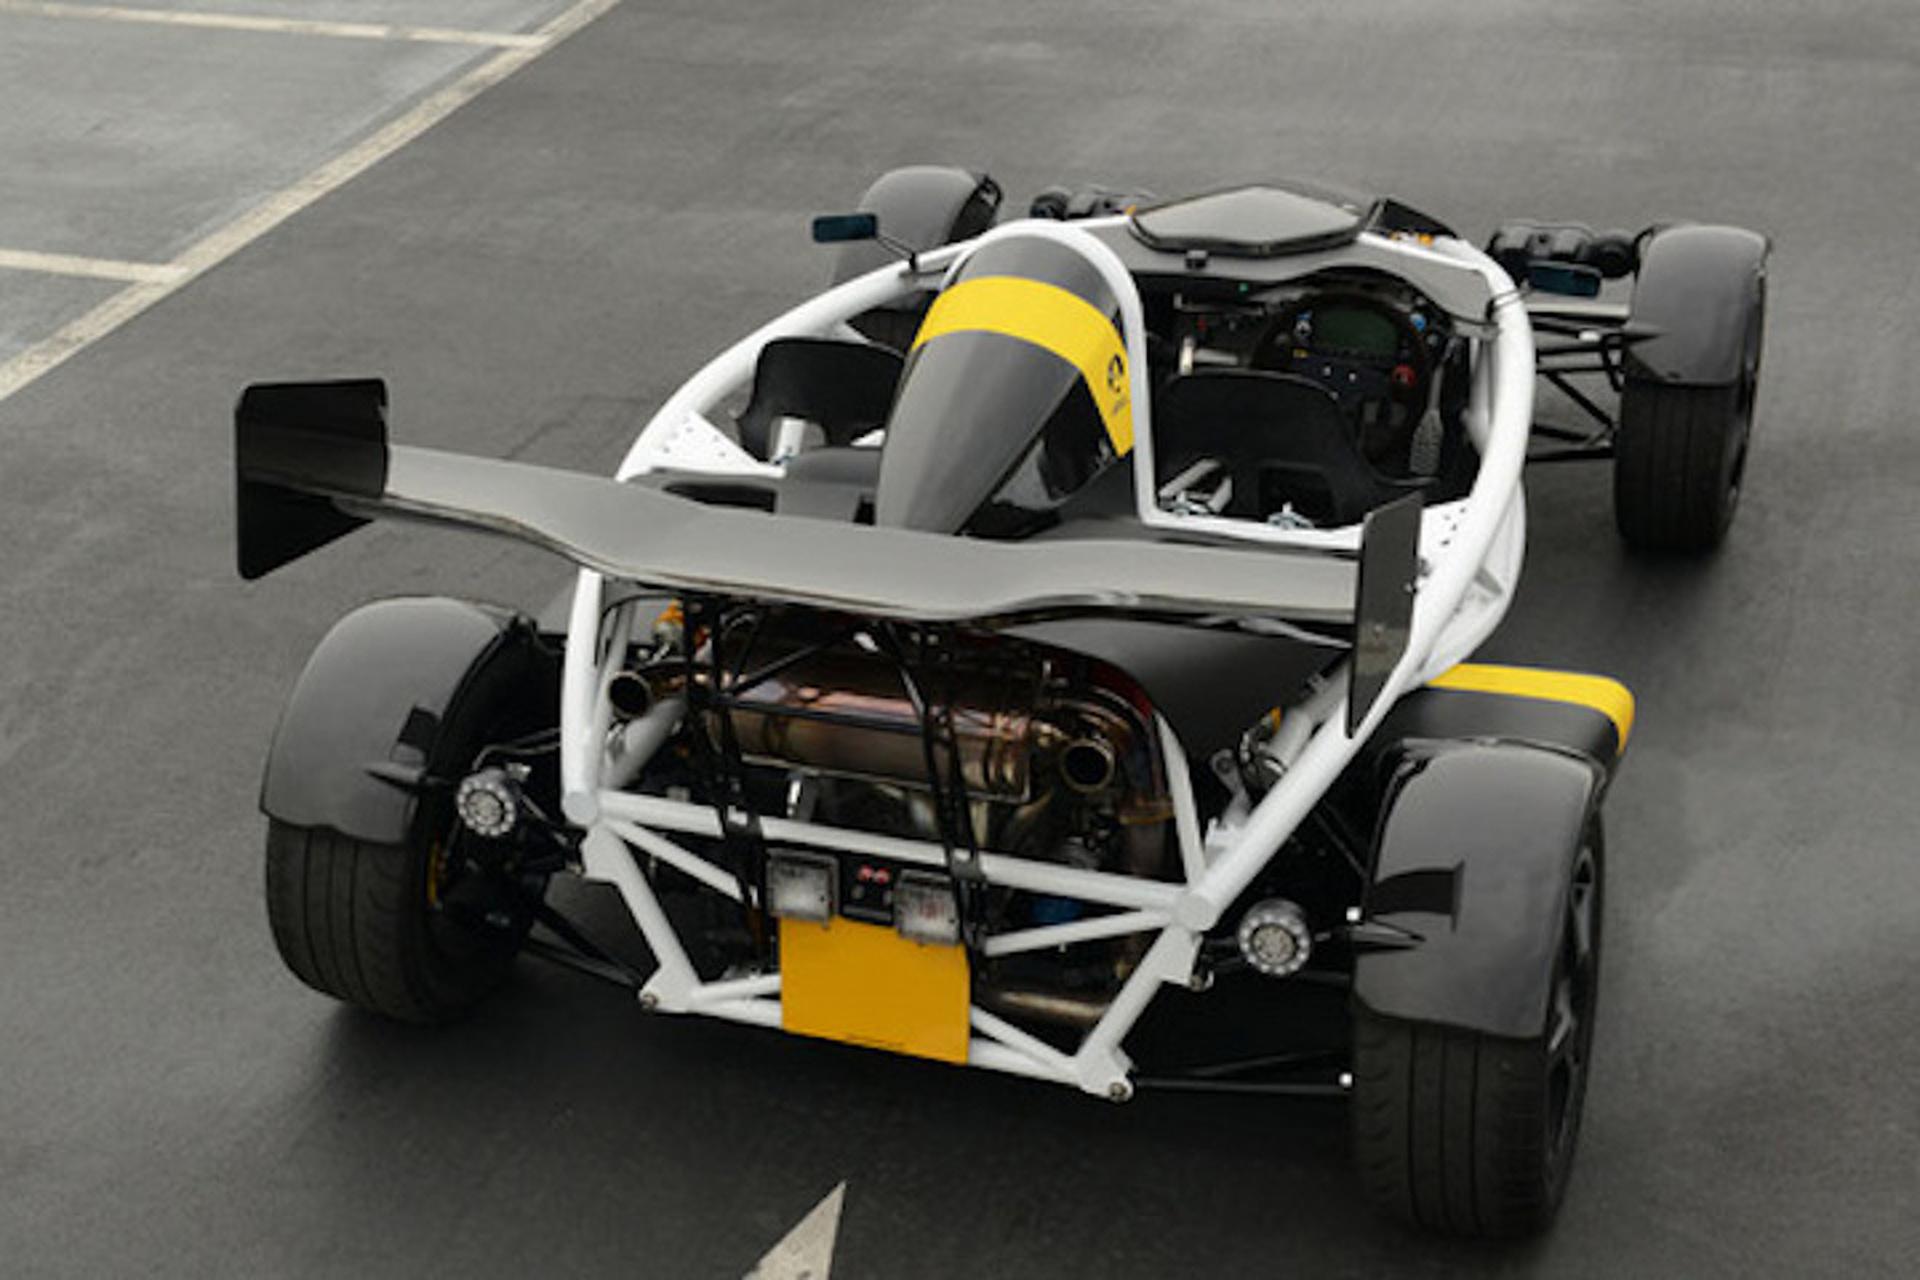 Ariel Atom 3 5r Debuts With Minimalist Looks Supercar